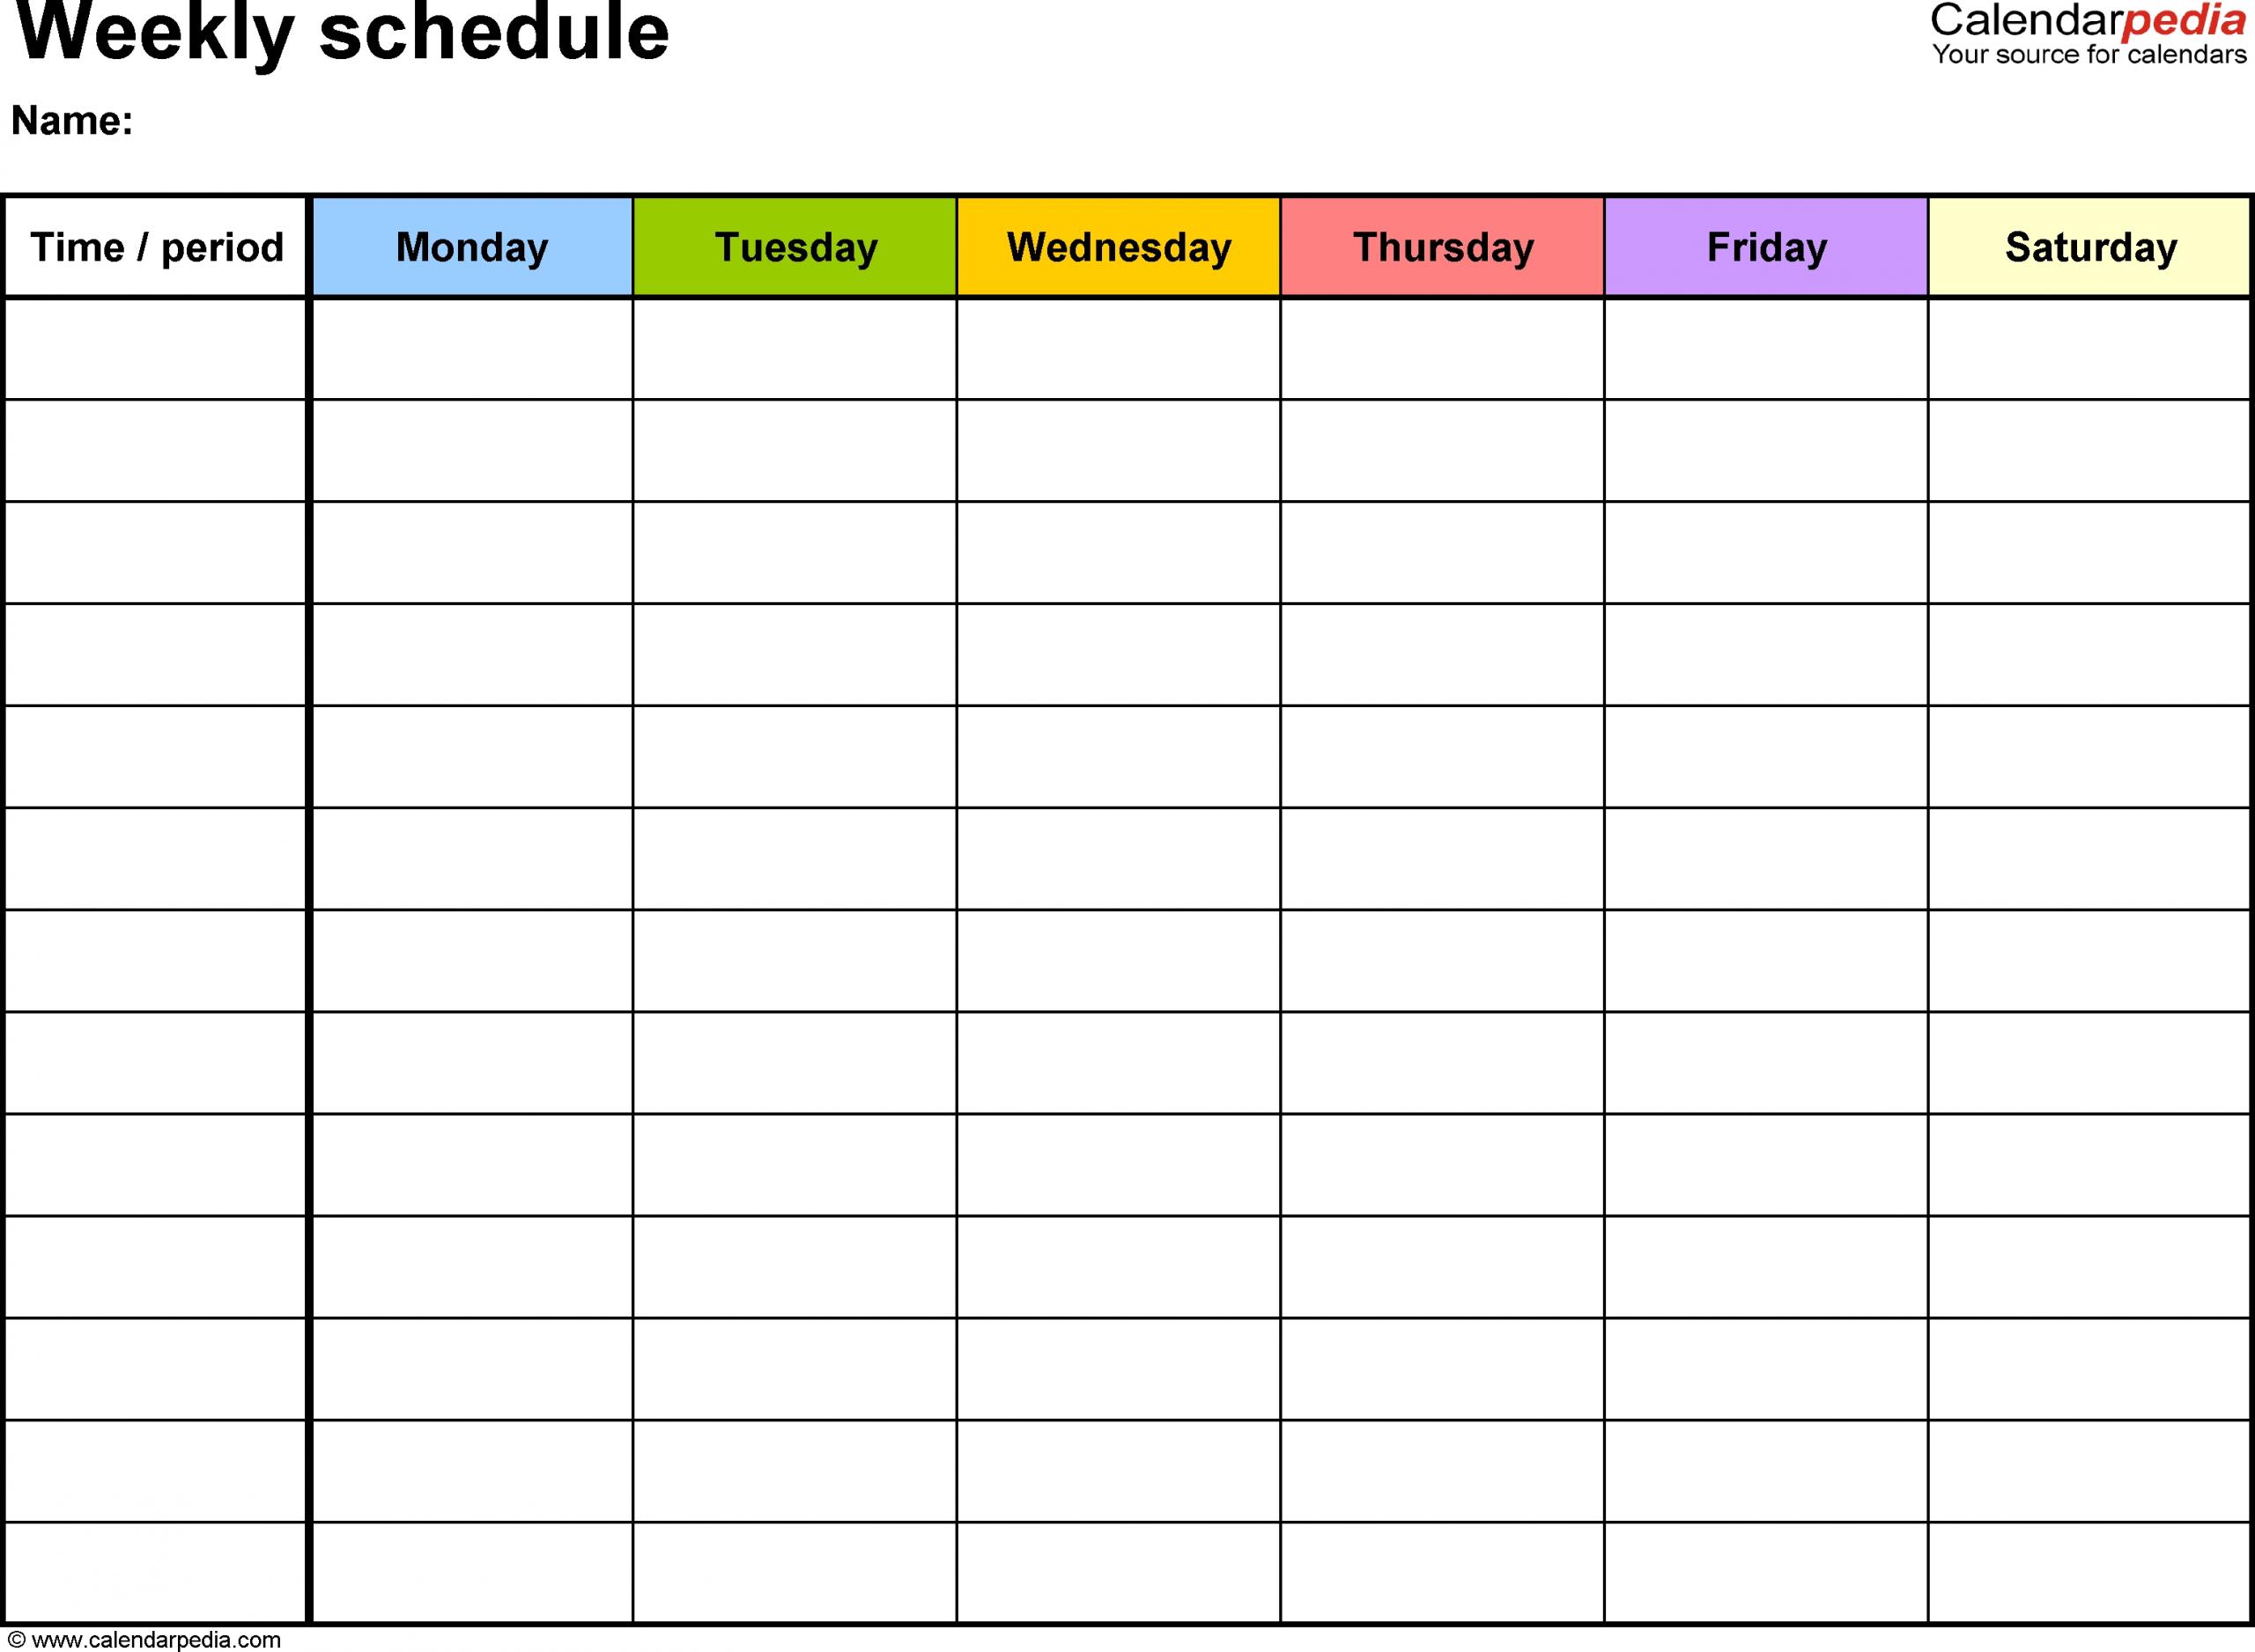 Template Monday To Friday | Calendar Template Printable Printable Weekly Calendar Monday - Friday